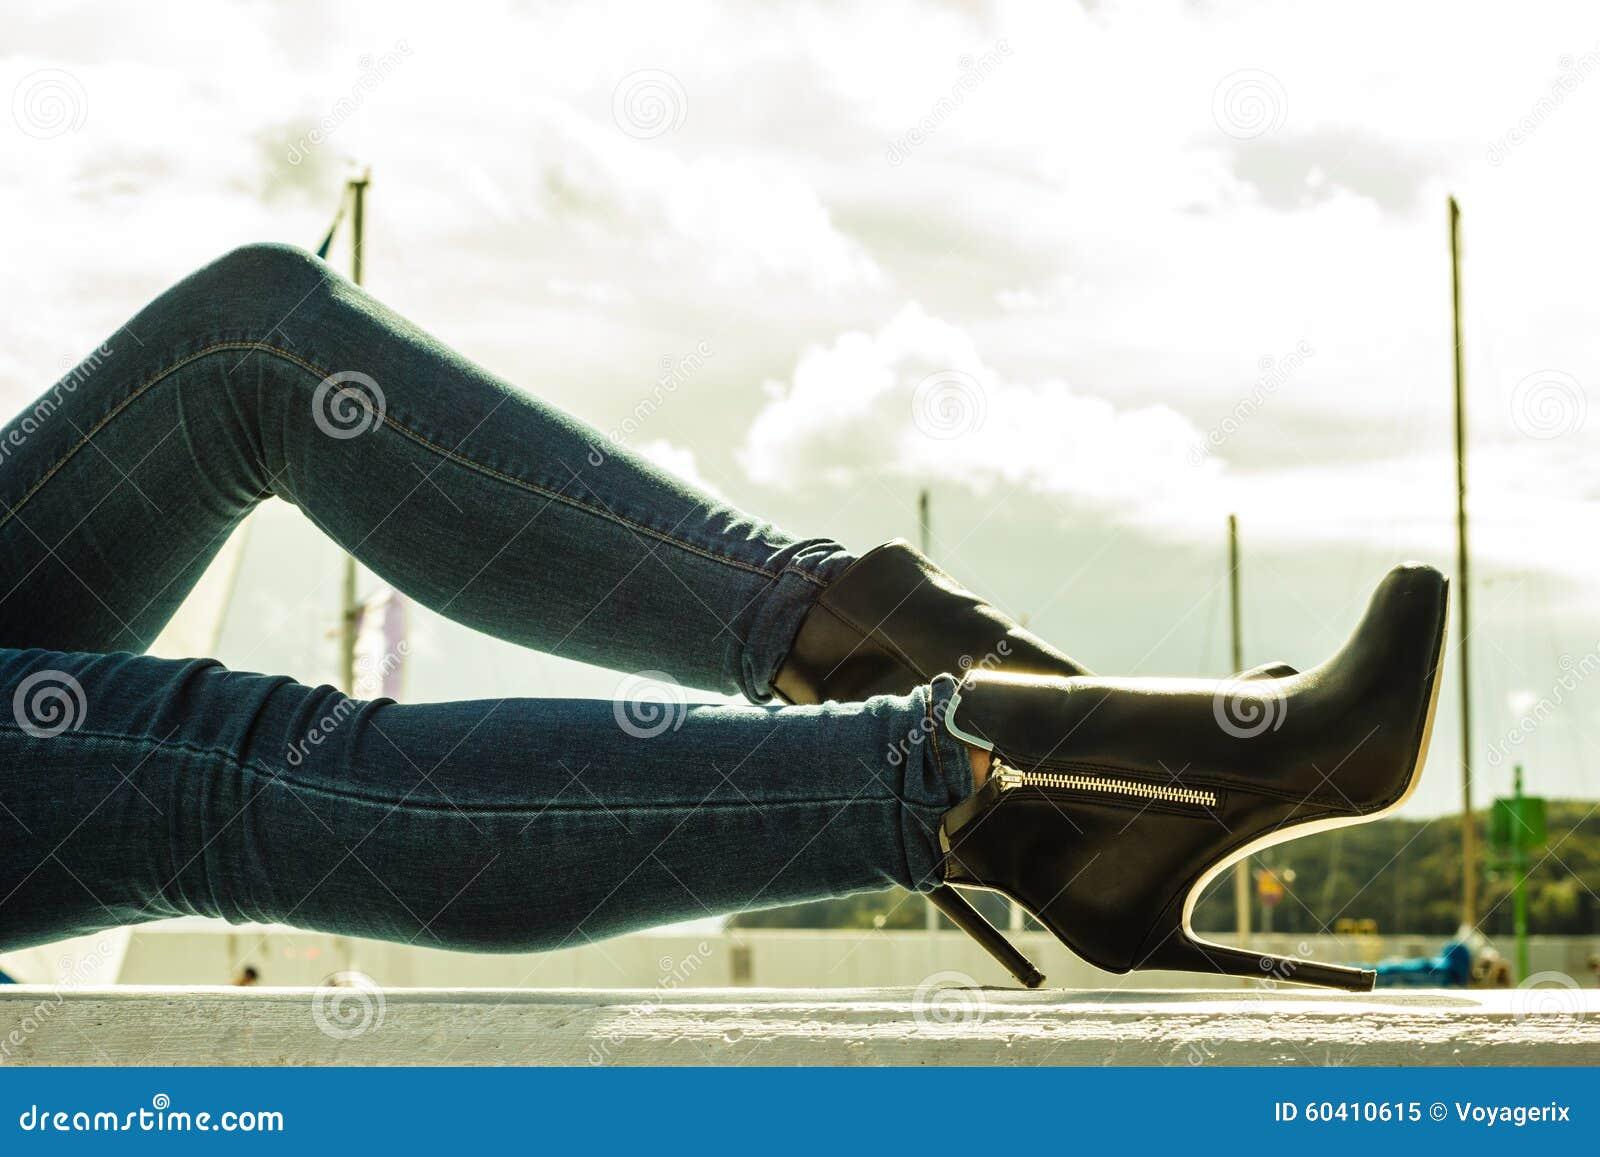 75fa63402a7 Εξάρτηση μόδας φθινοπώρου Τα μοντέρνα μακριά πόδια γυναικών στο τζιν  ασθμαίνουν τα μαύρα μοντέρνα υψηλά παπούτσια τακουνιών υπαίθρια στην οδό  πόλεων